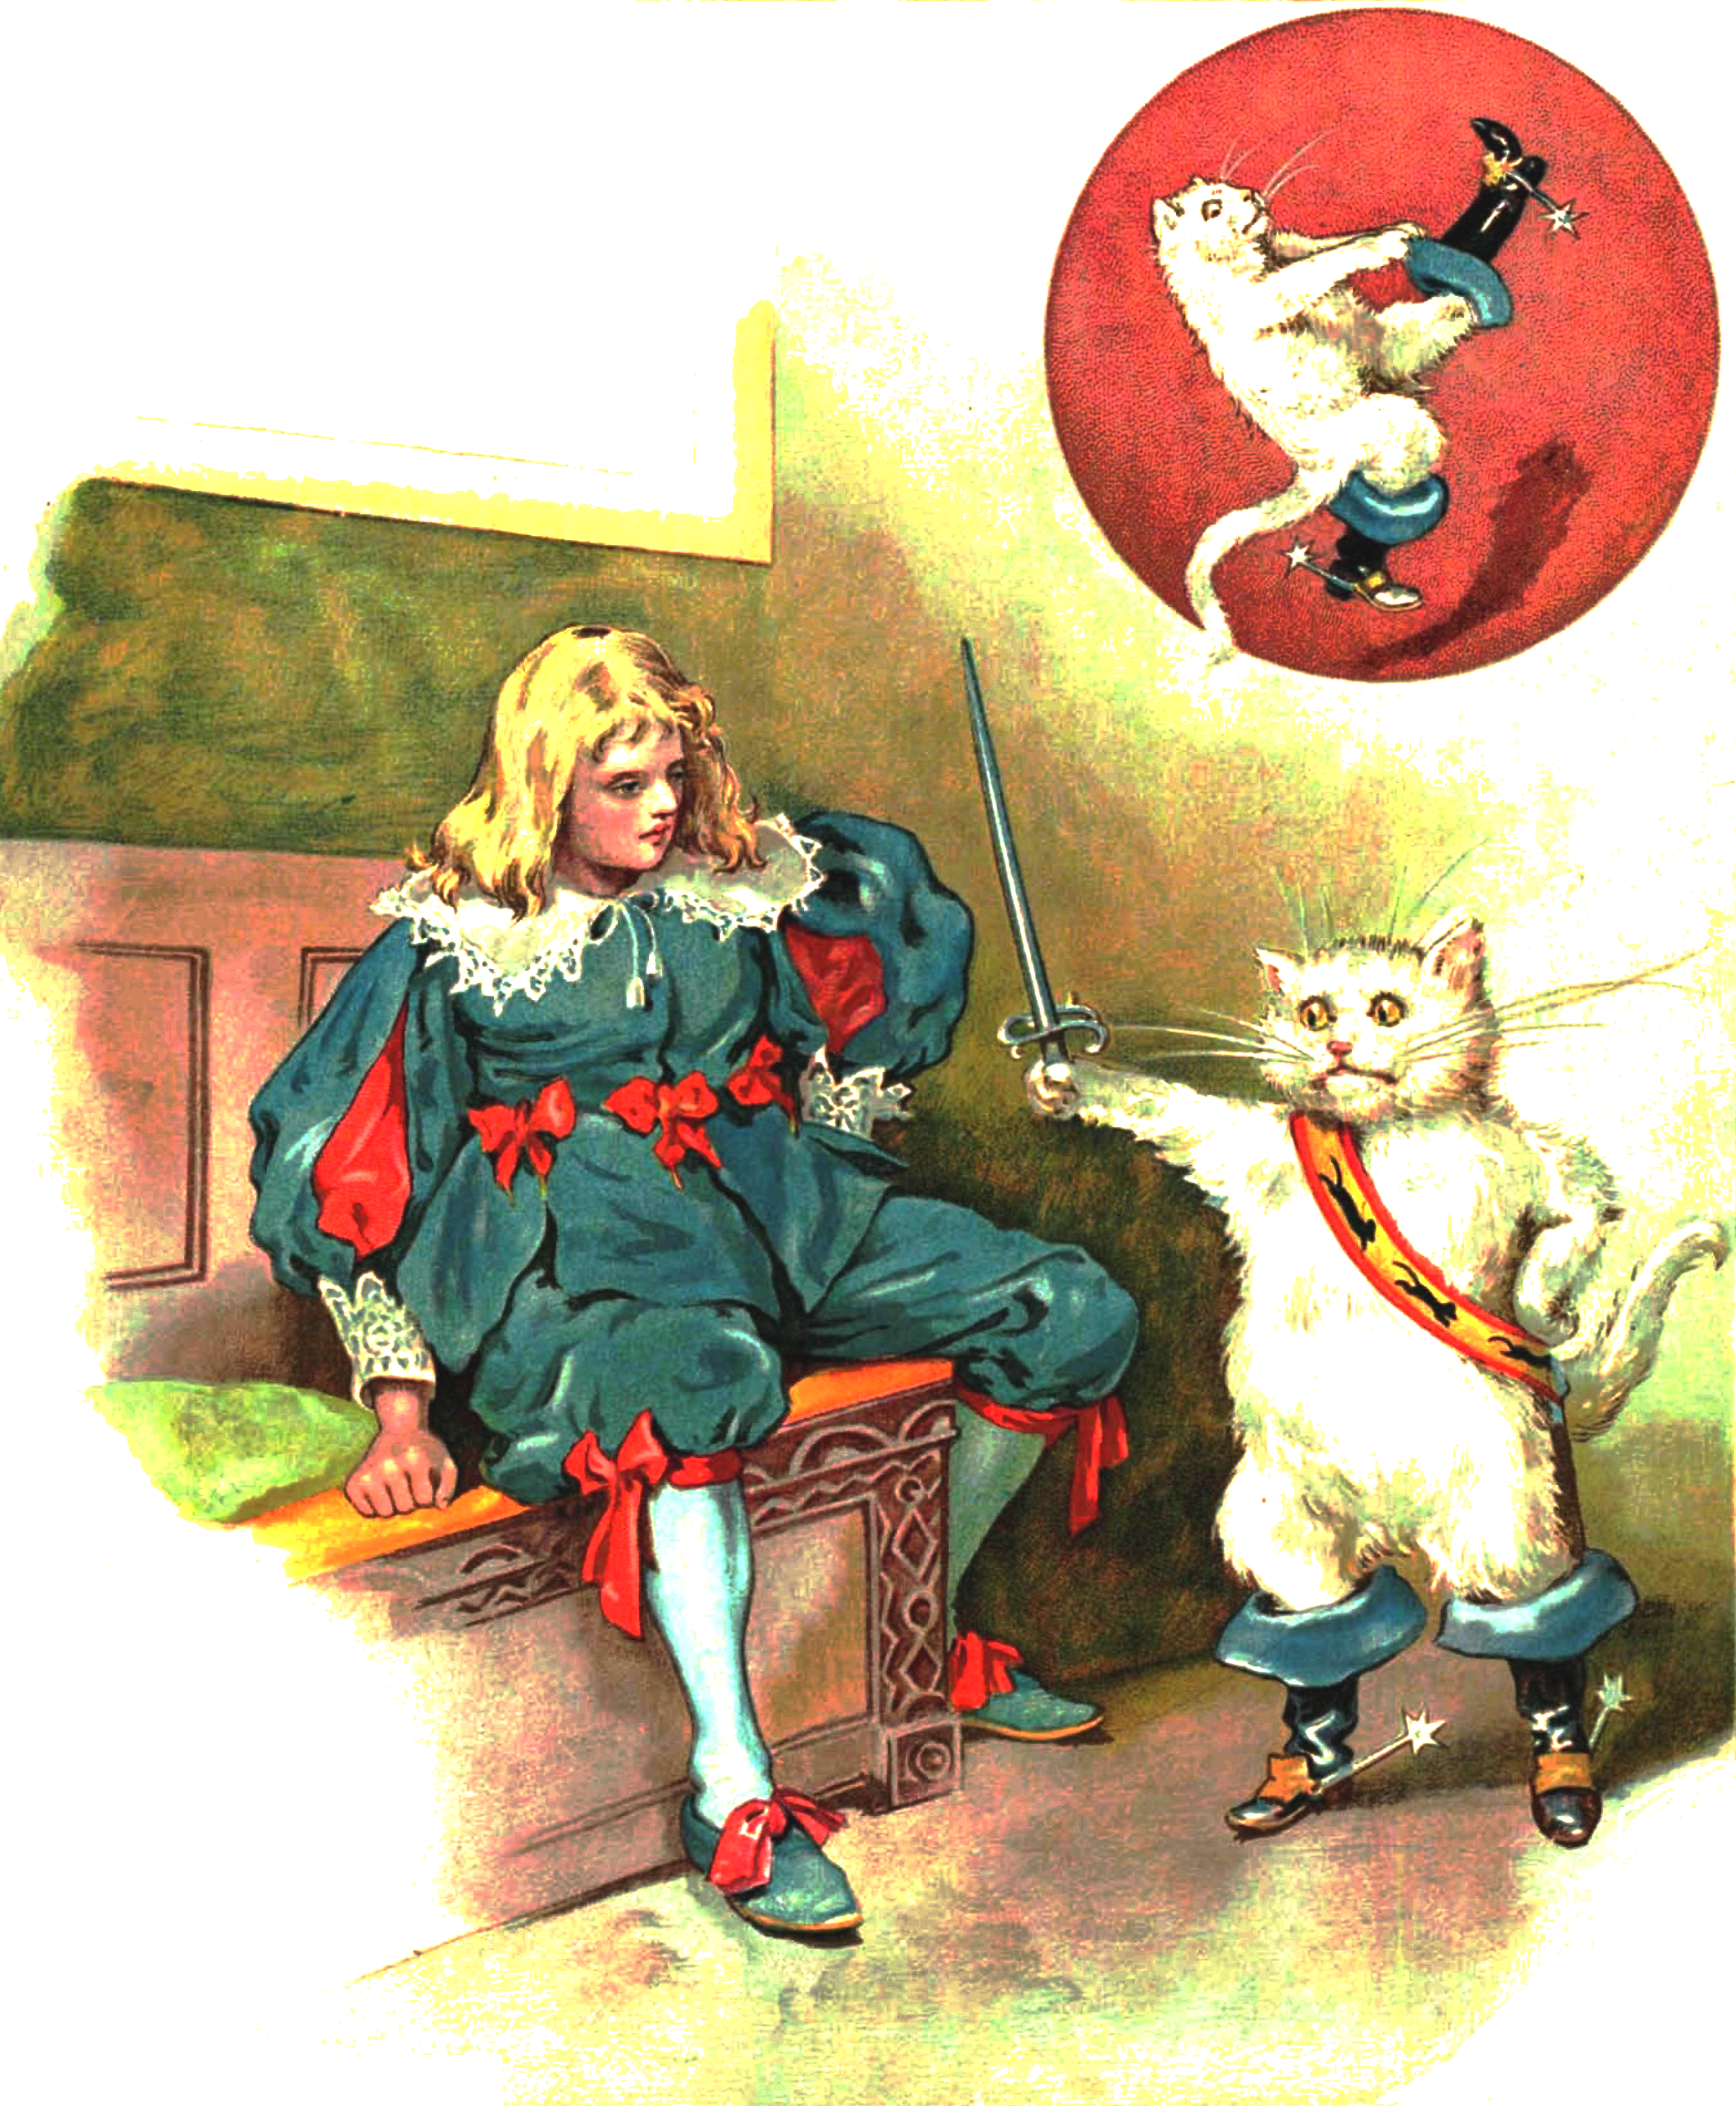 Filekot W Butach Artur Oppman Page 0004apng Wikimedia Commons